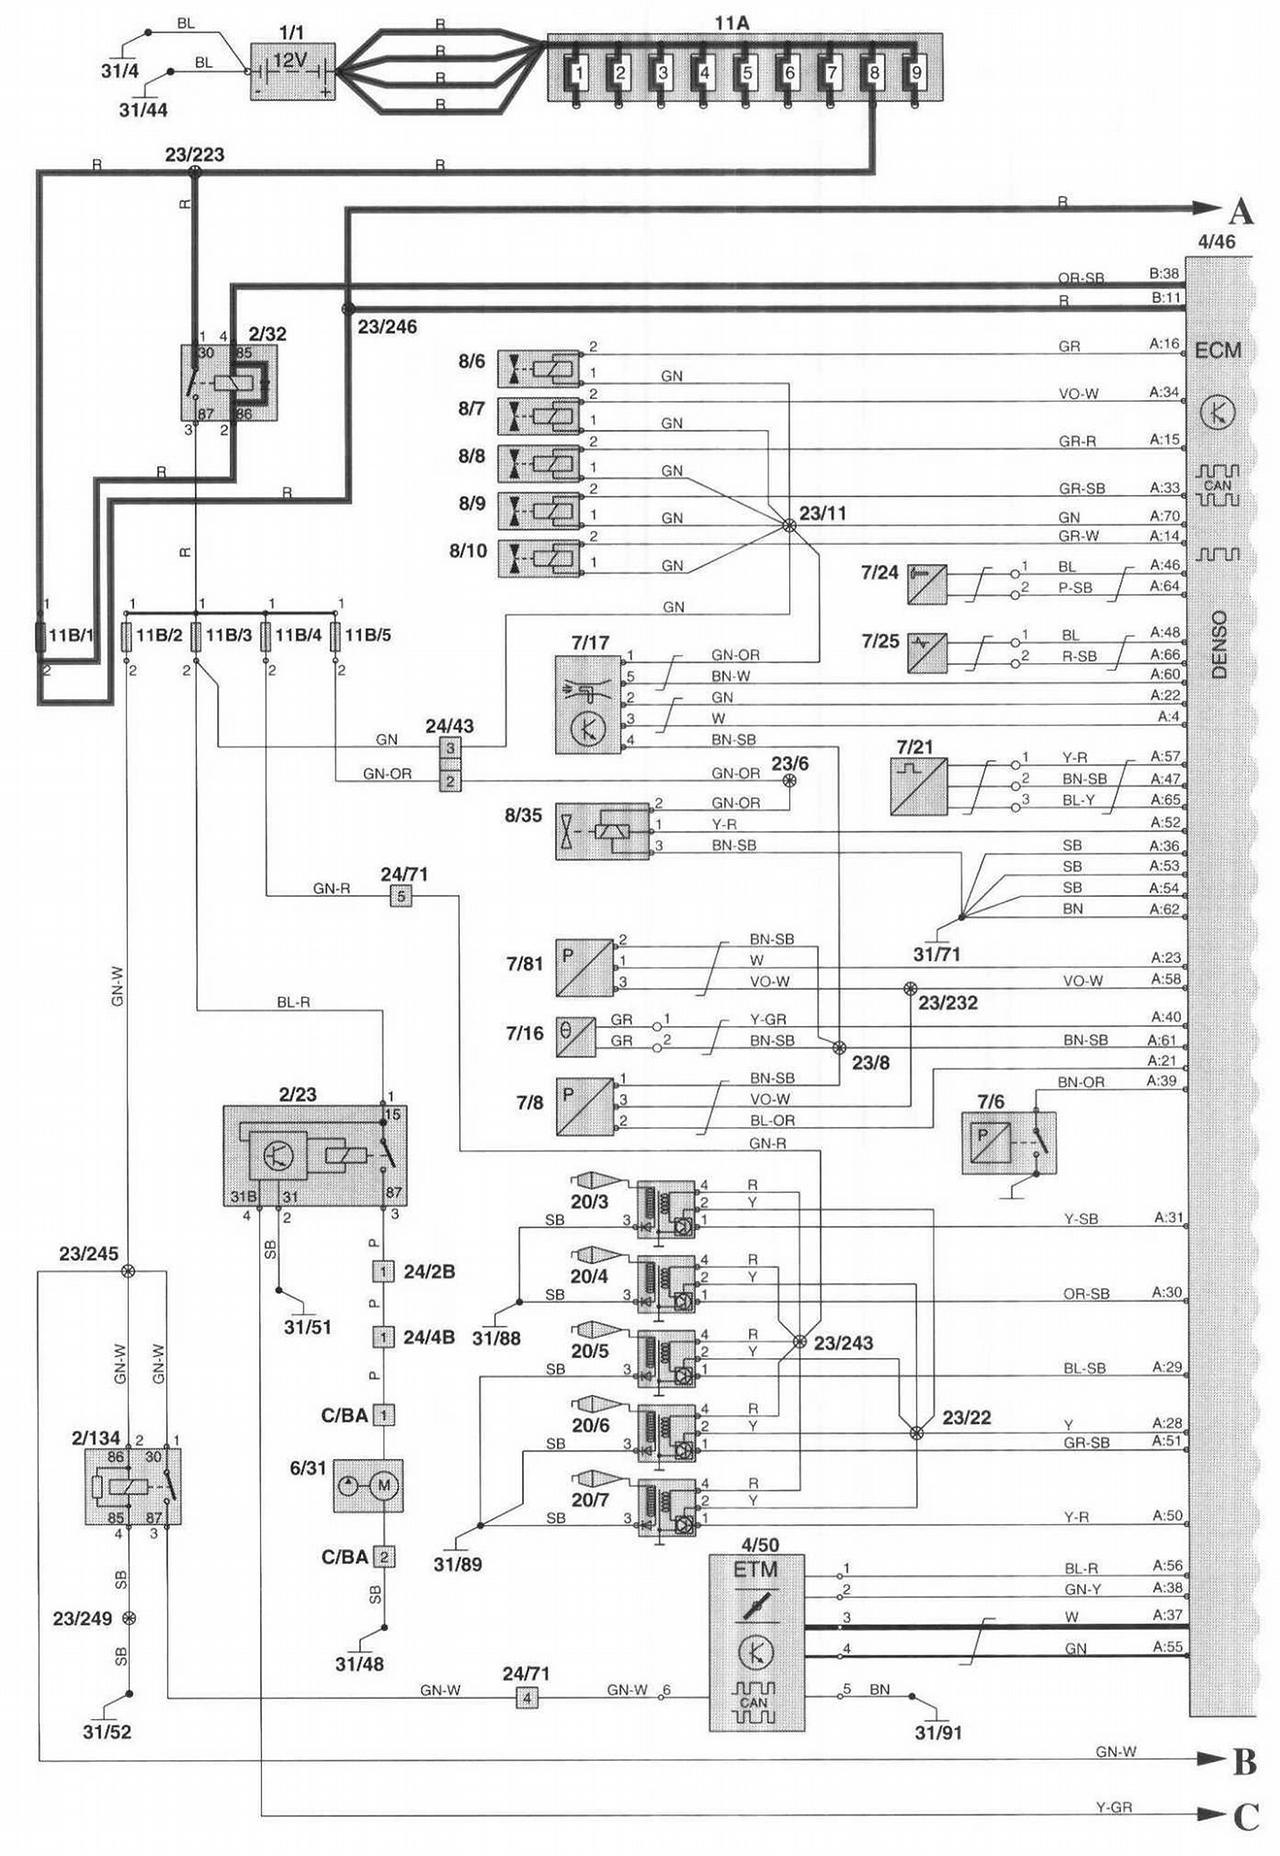 2004 Volvo Xc90 Wiring Diagrams Electrical Wiring Diagram